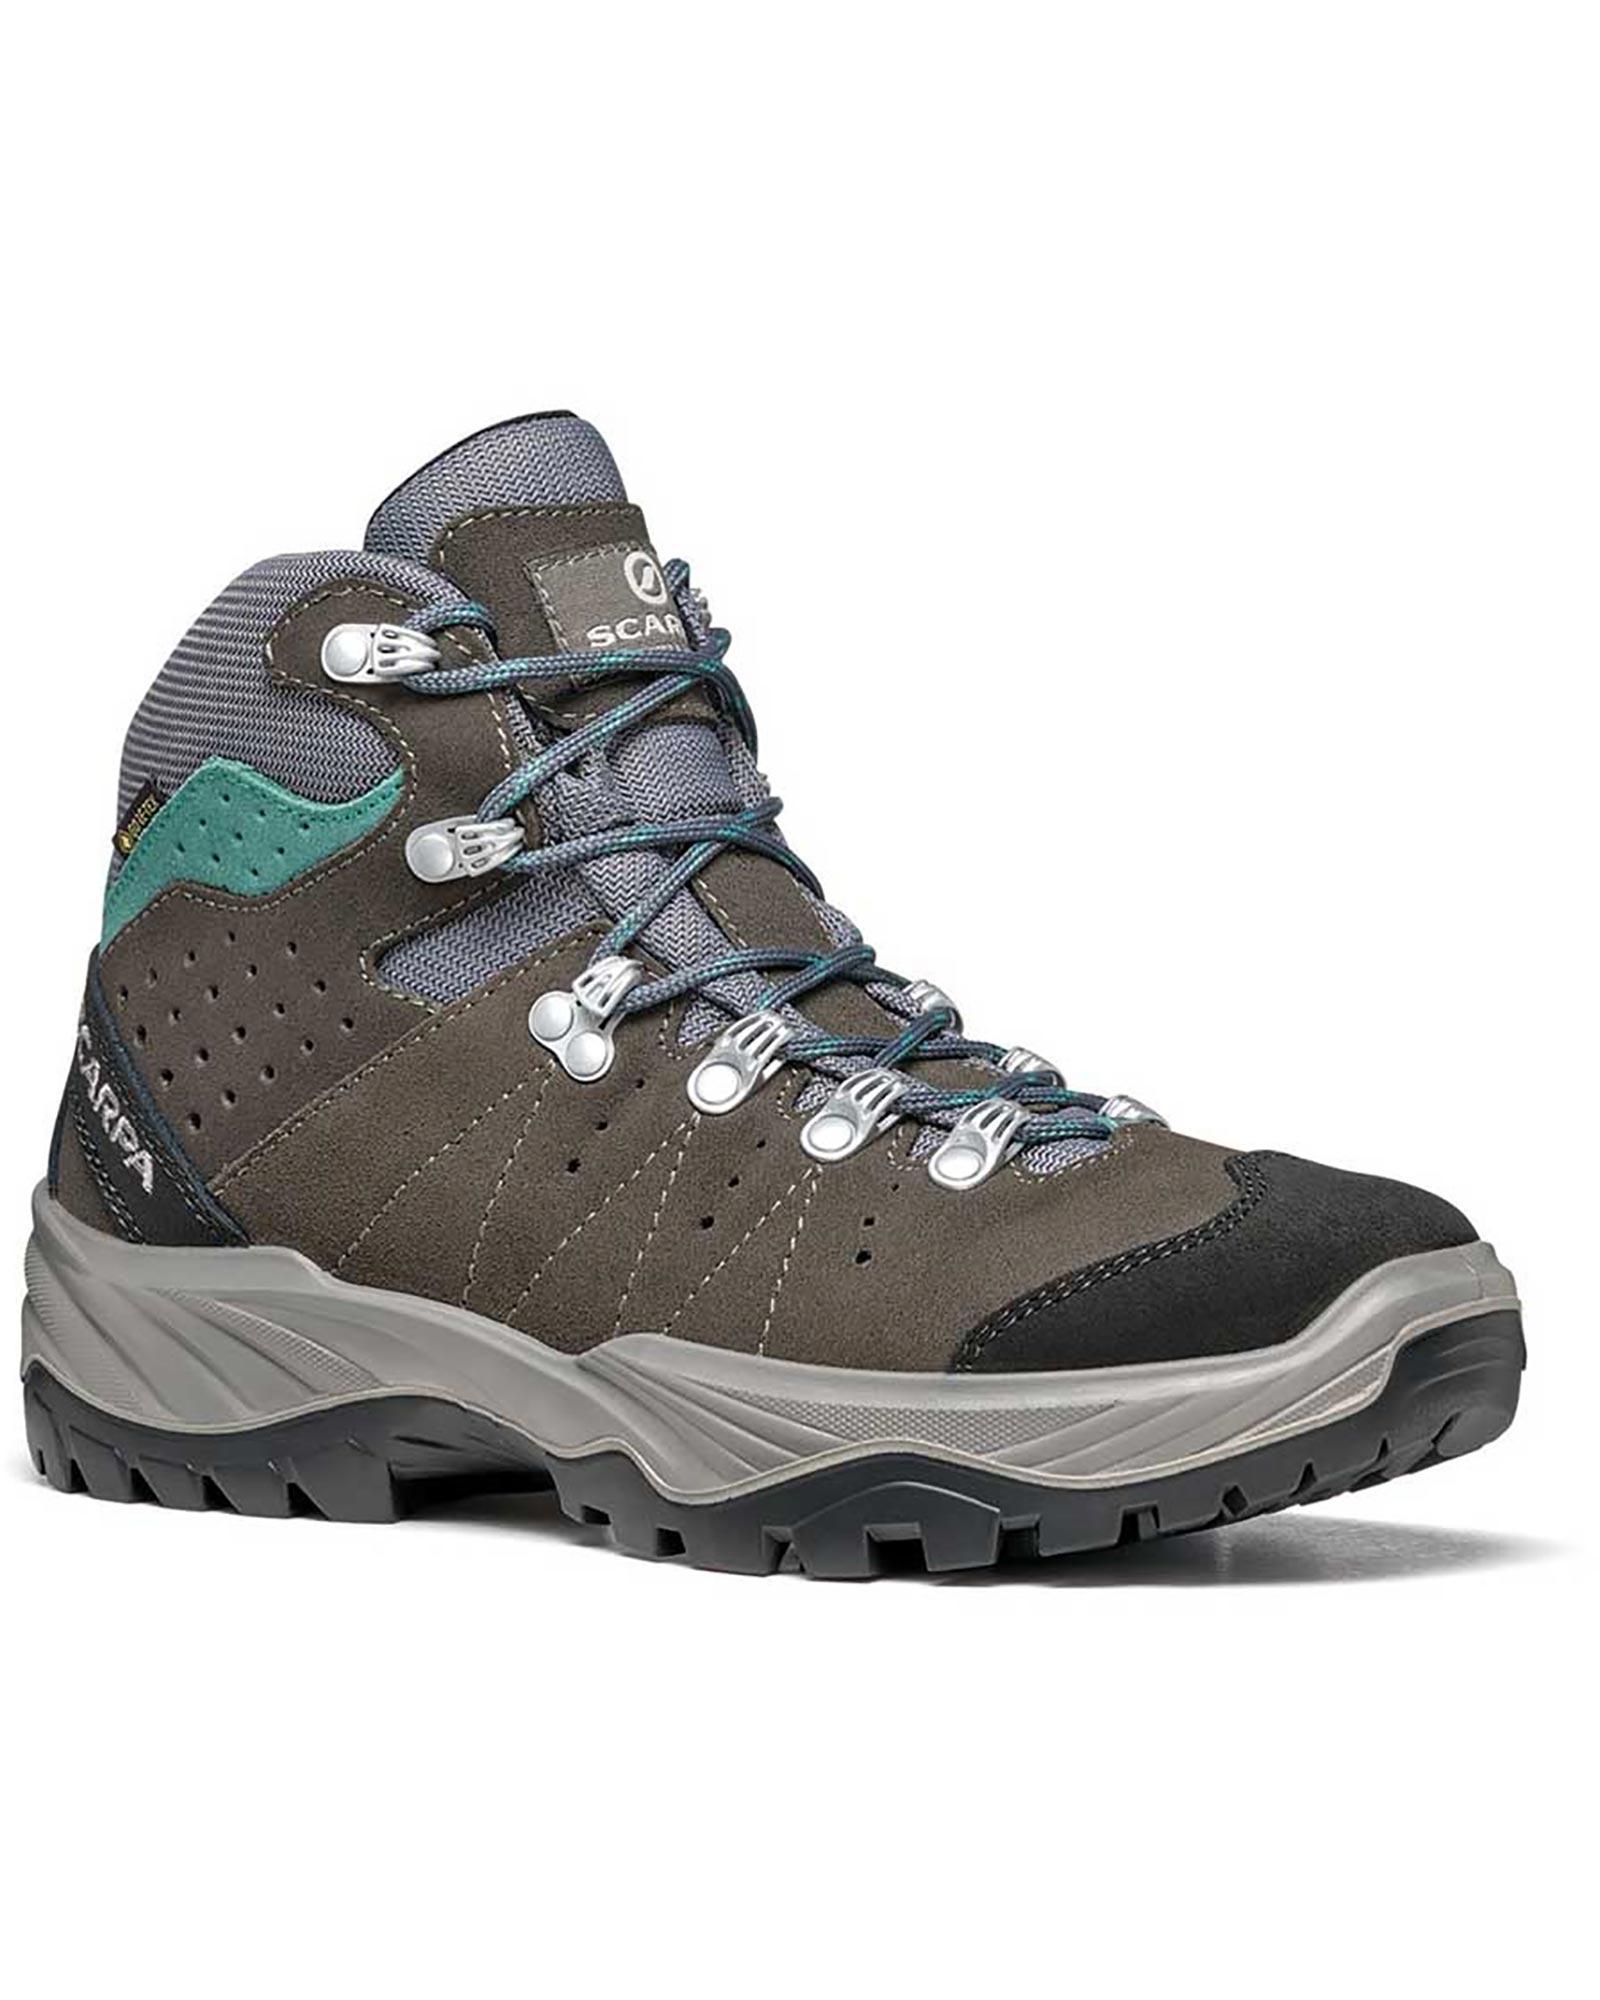 Scarpa Mistral GORE-TEX Women's Boots 0